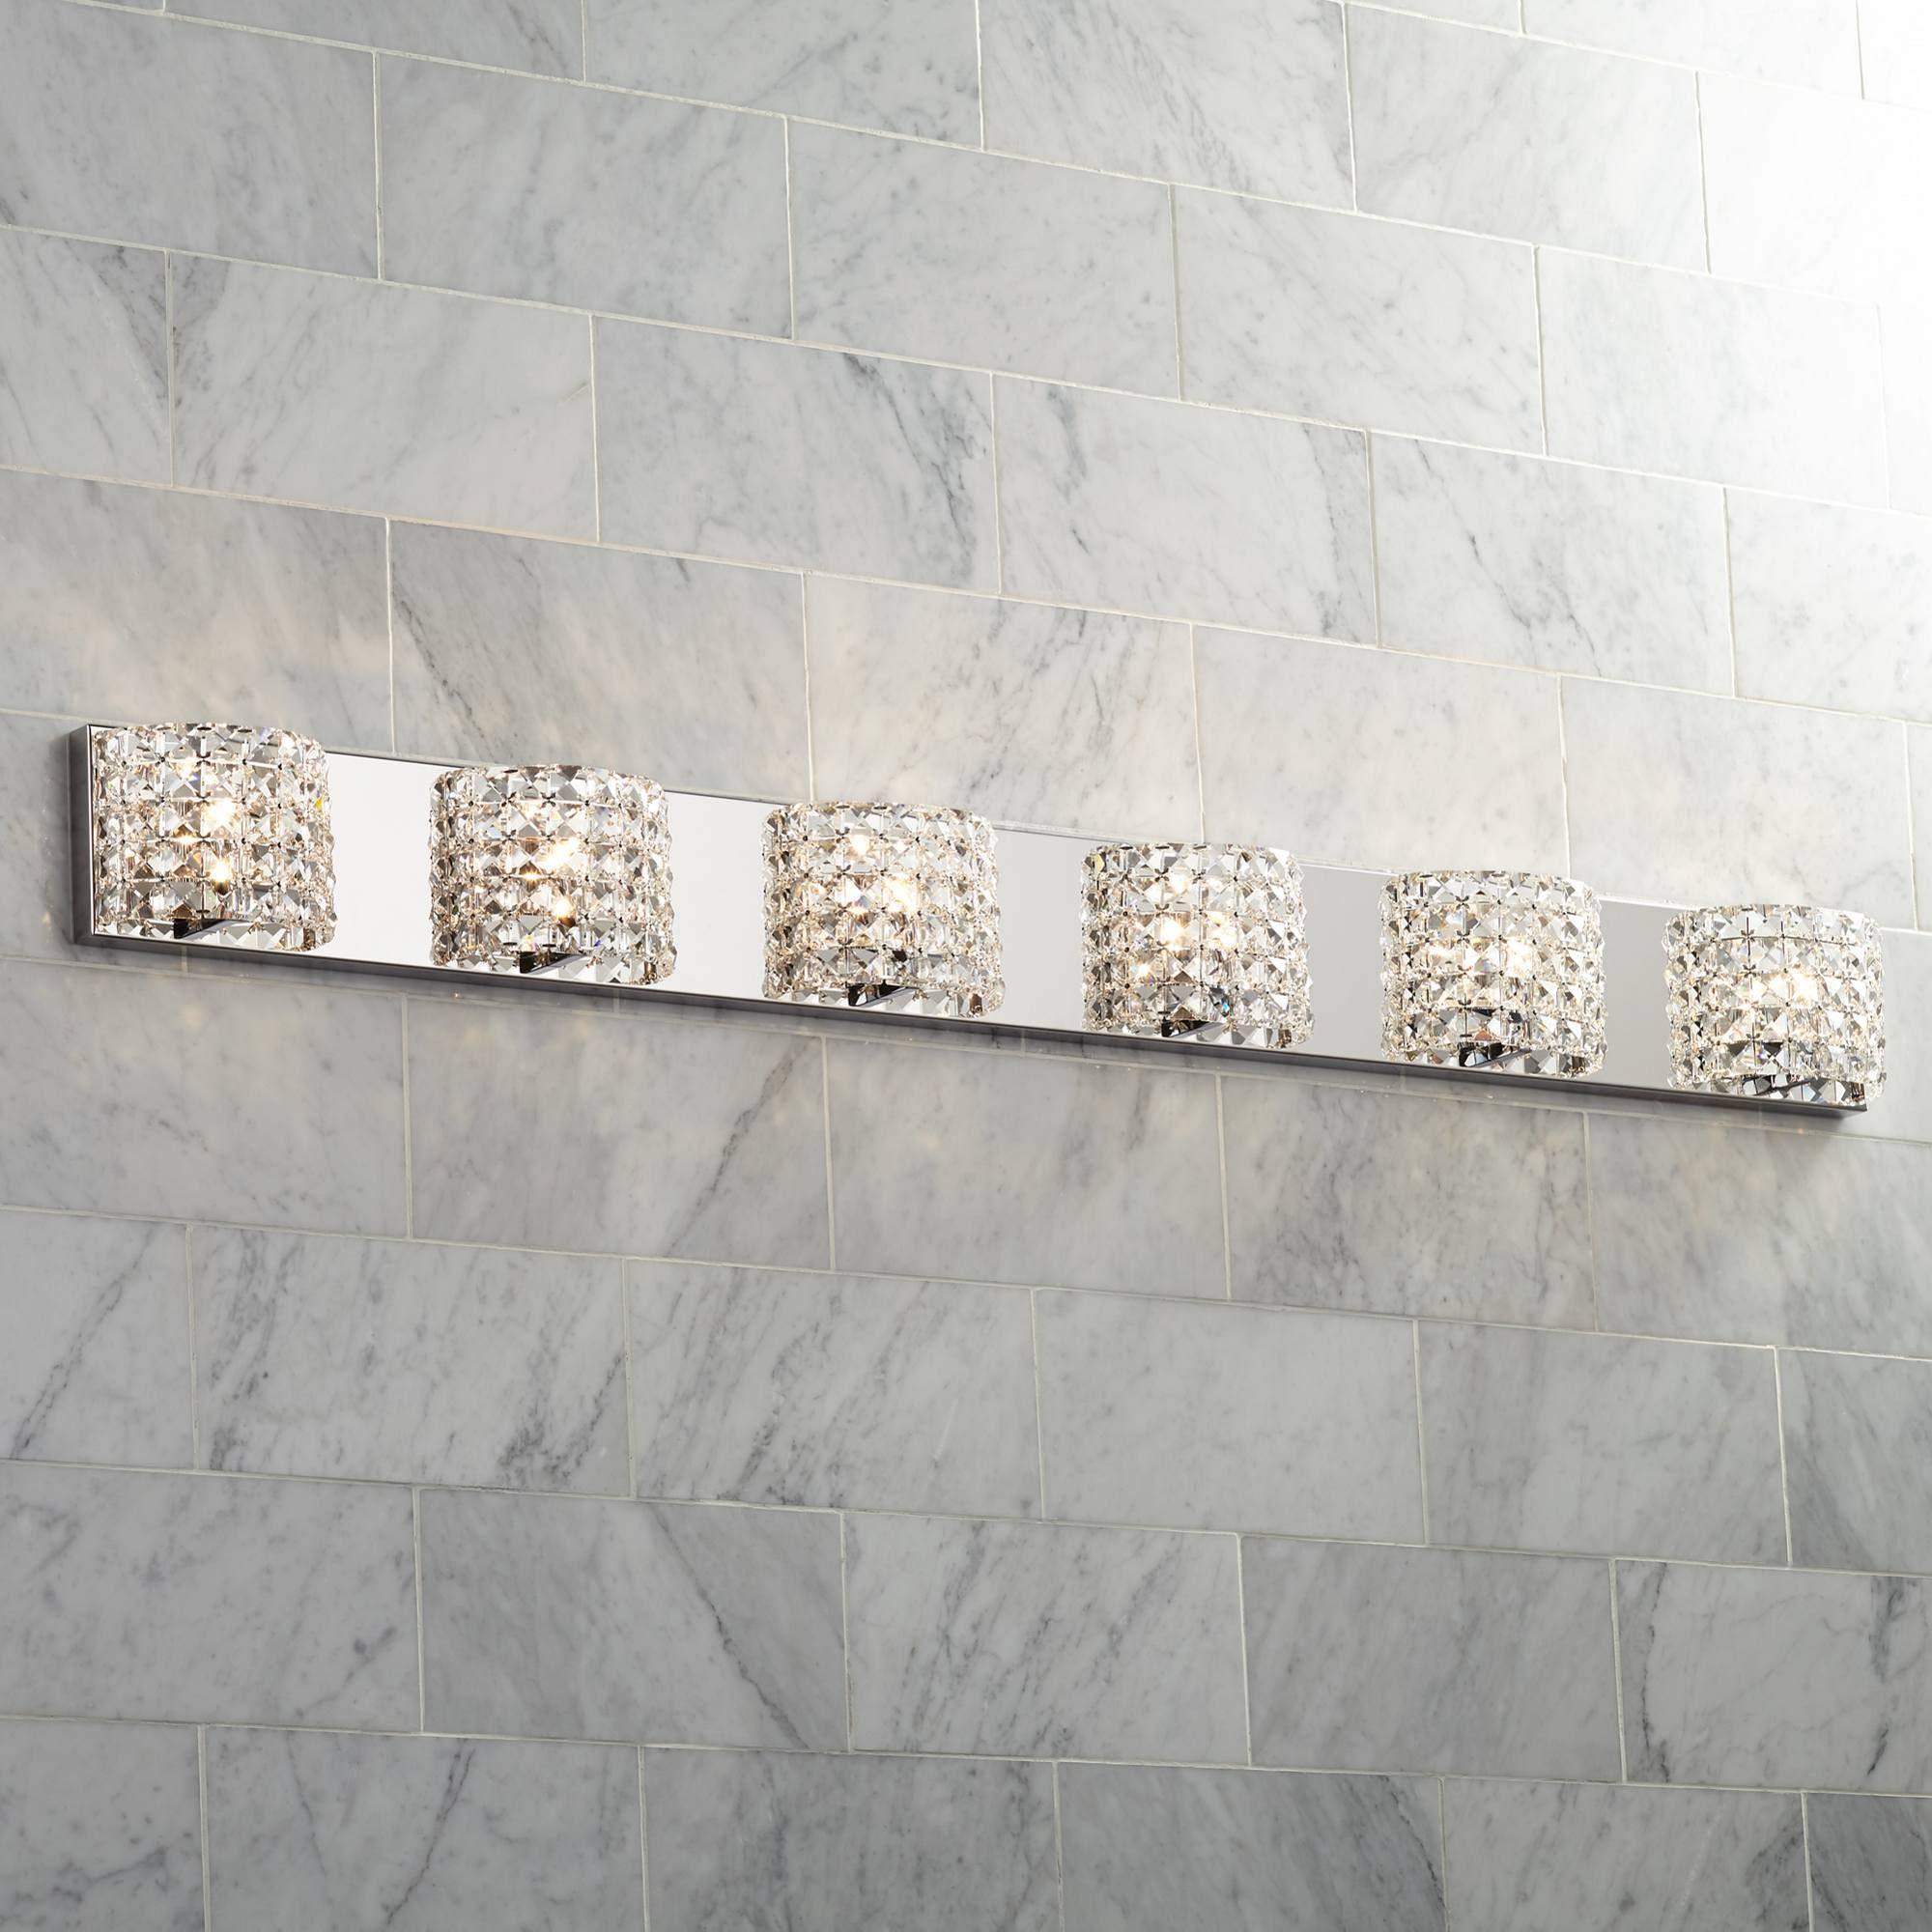 Vienna Full Spectrum Cesenna 55''W 6 Light Crystal Bath Light - Vienna Full Spectrum